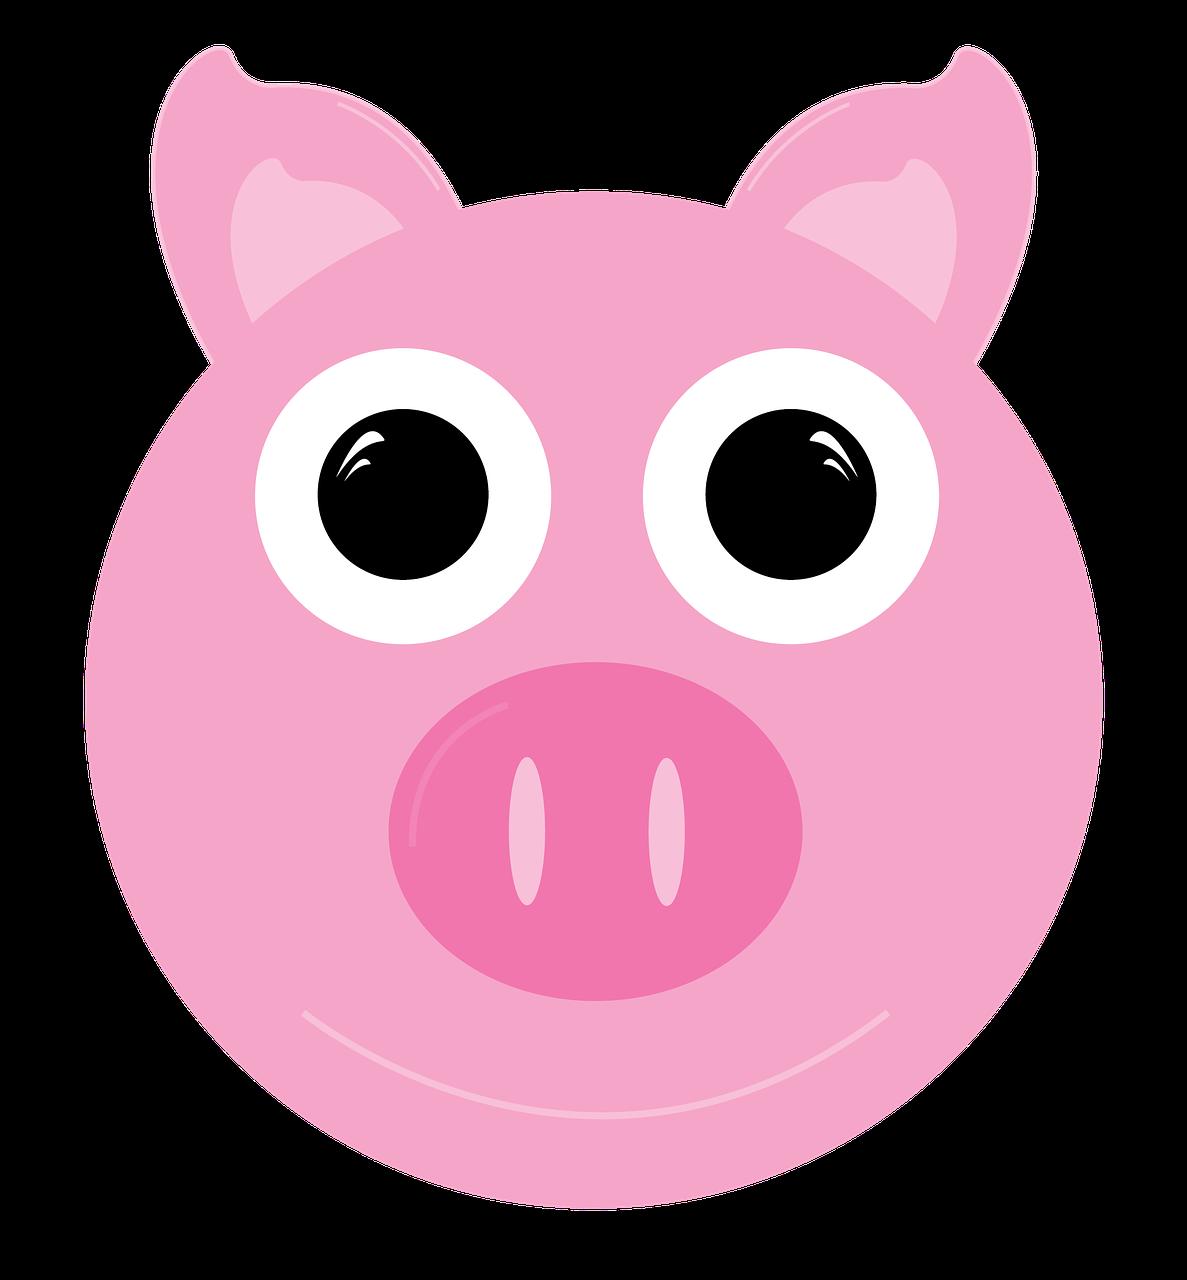 Clipart pig domestic animal. Pork farm cartoon free